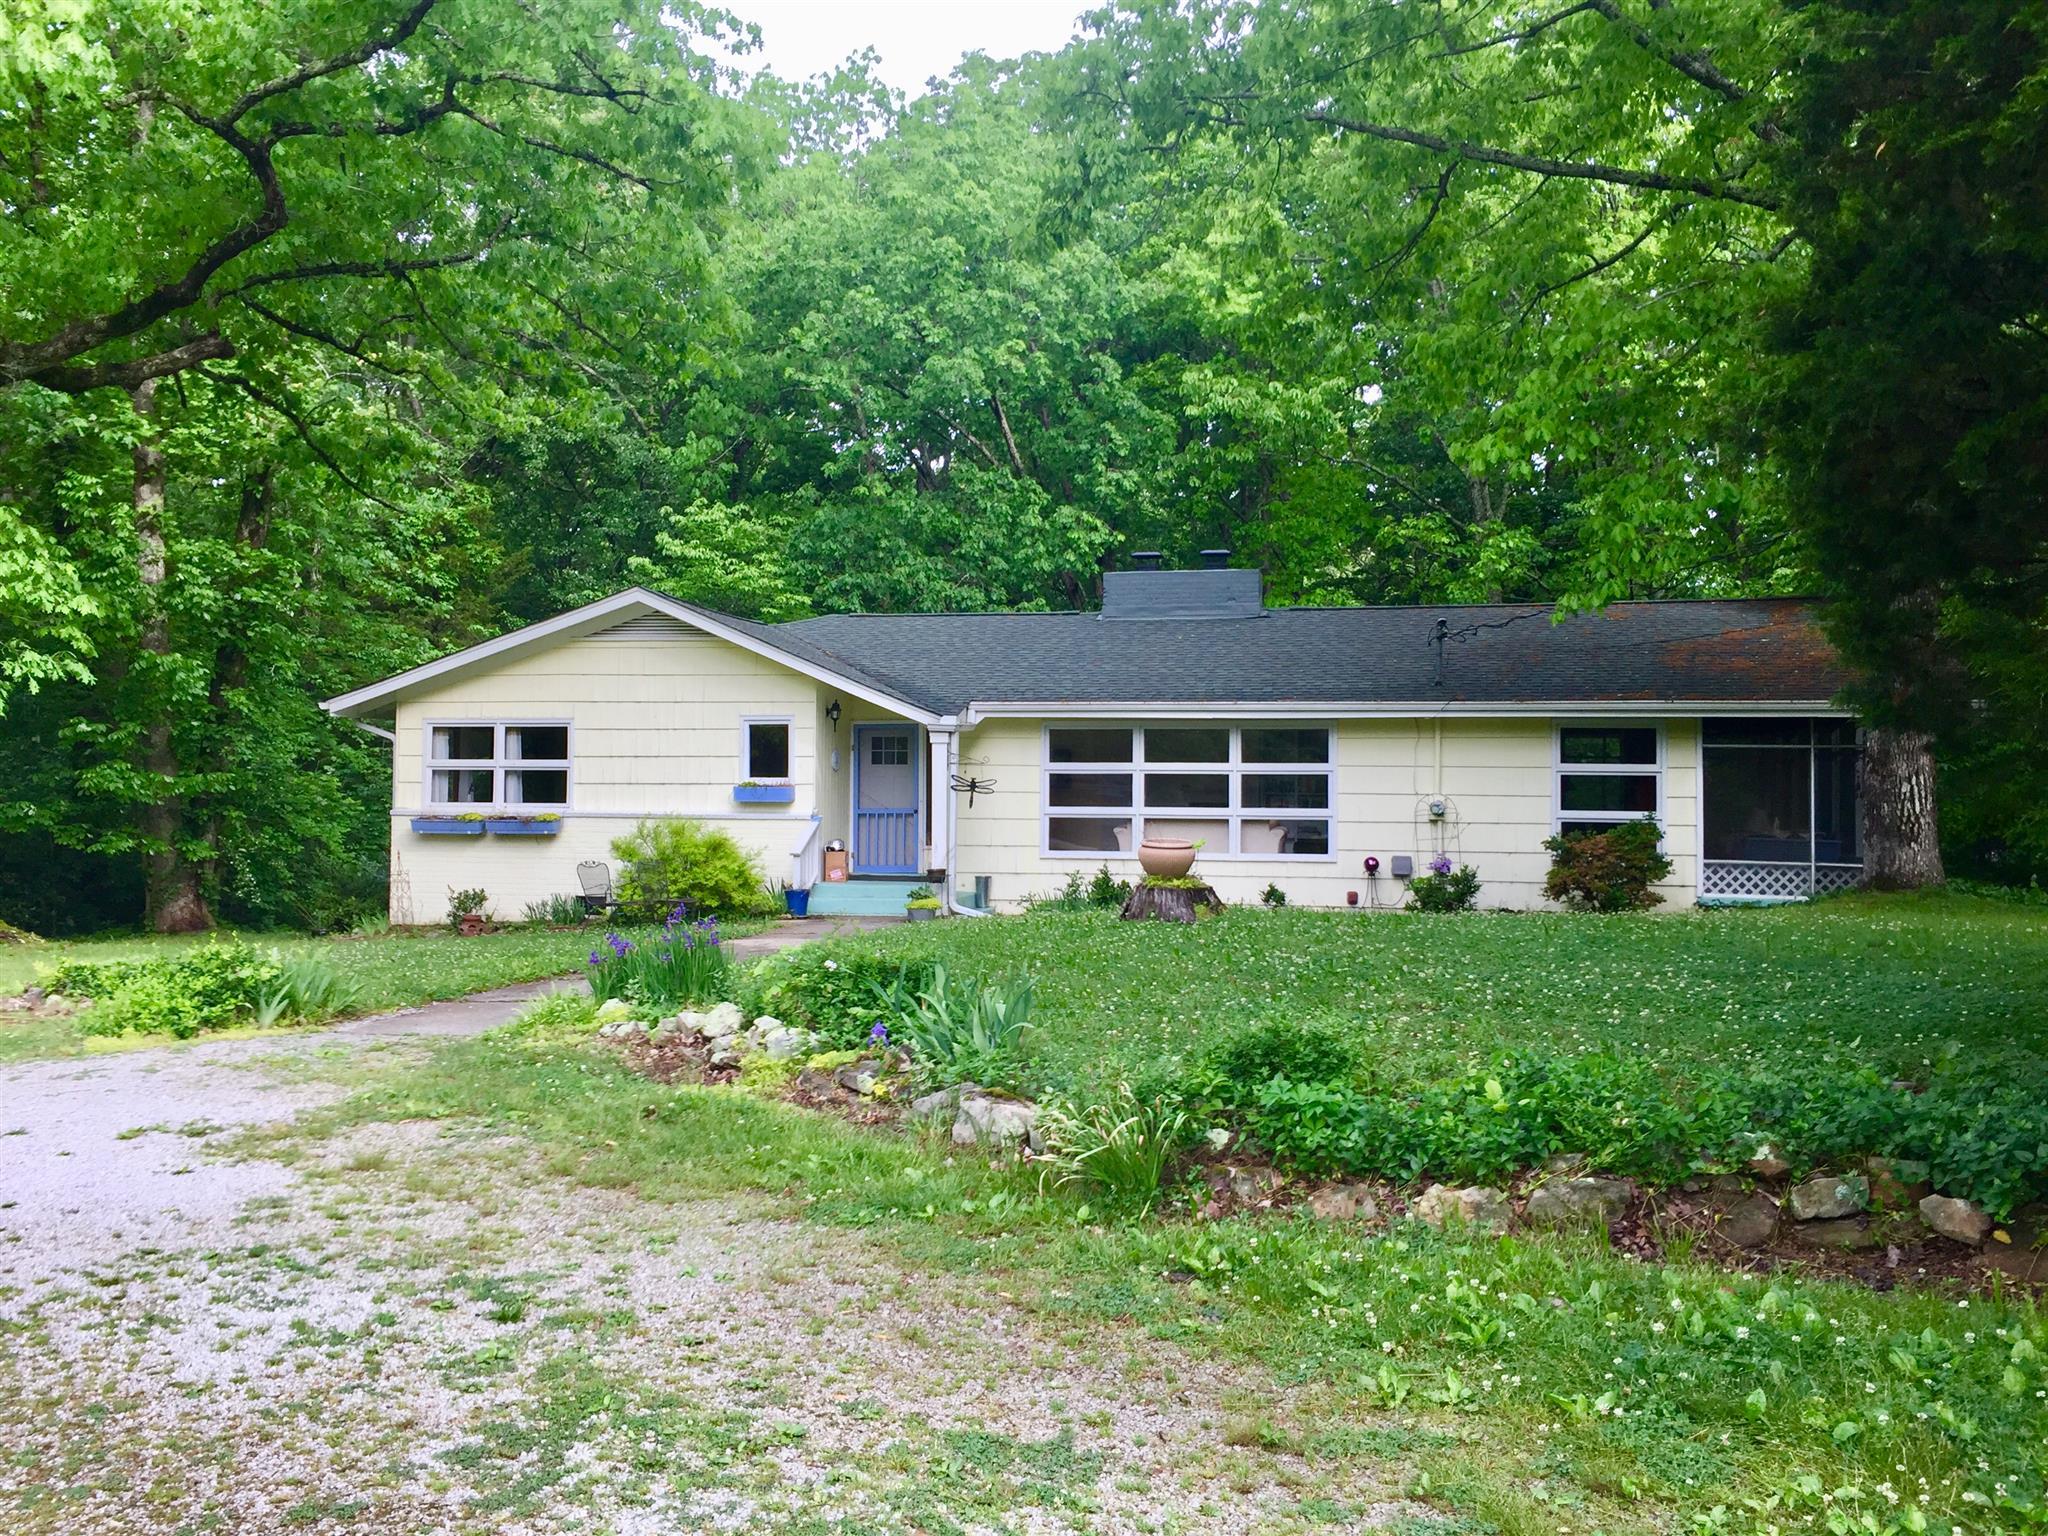 482 Tennessee Ave, Sewanee, TN 37375 - Sewanee, TN real estate listing